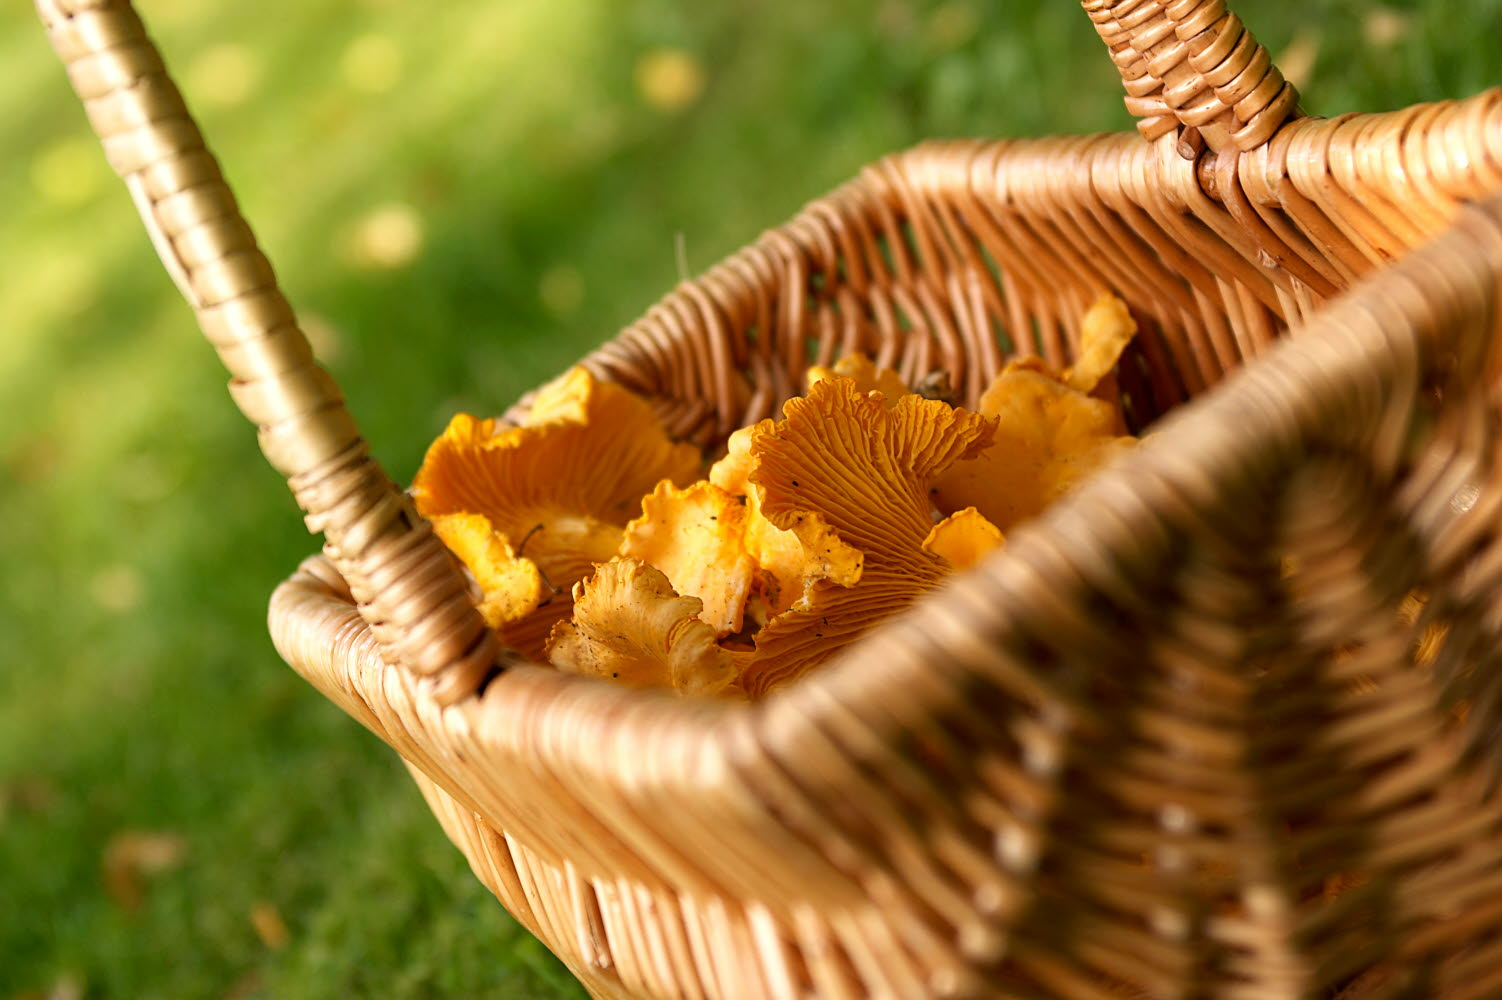 Basket of chanterelles - Photo cred Jonas Ingman